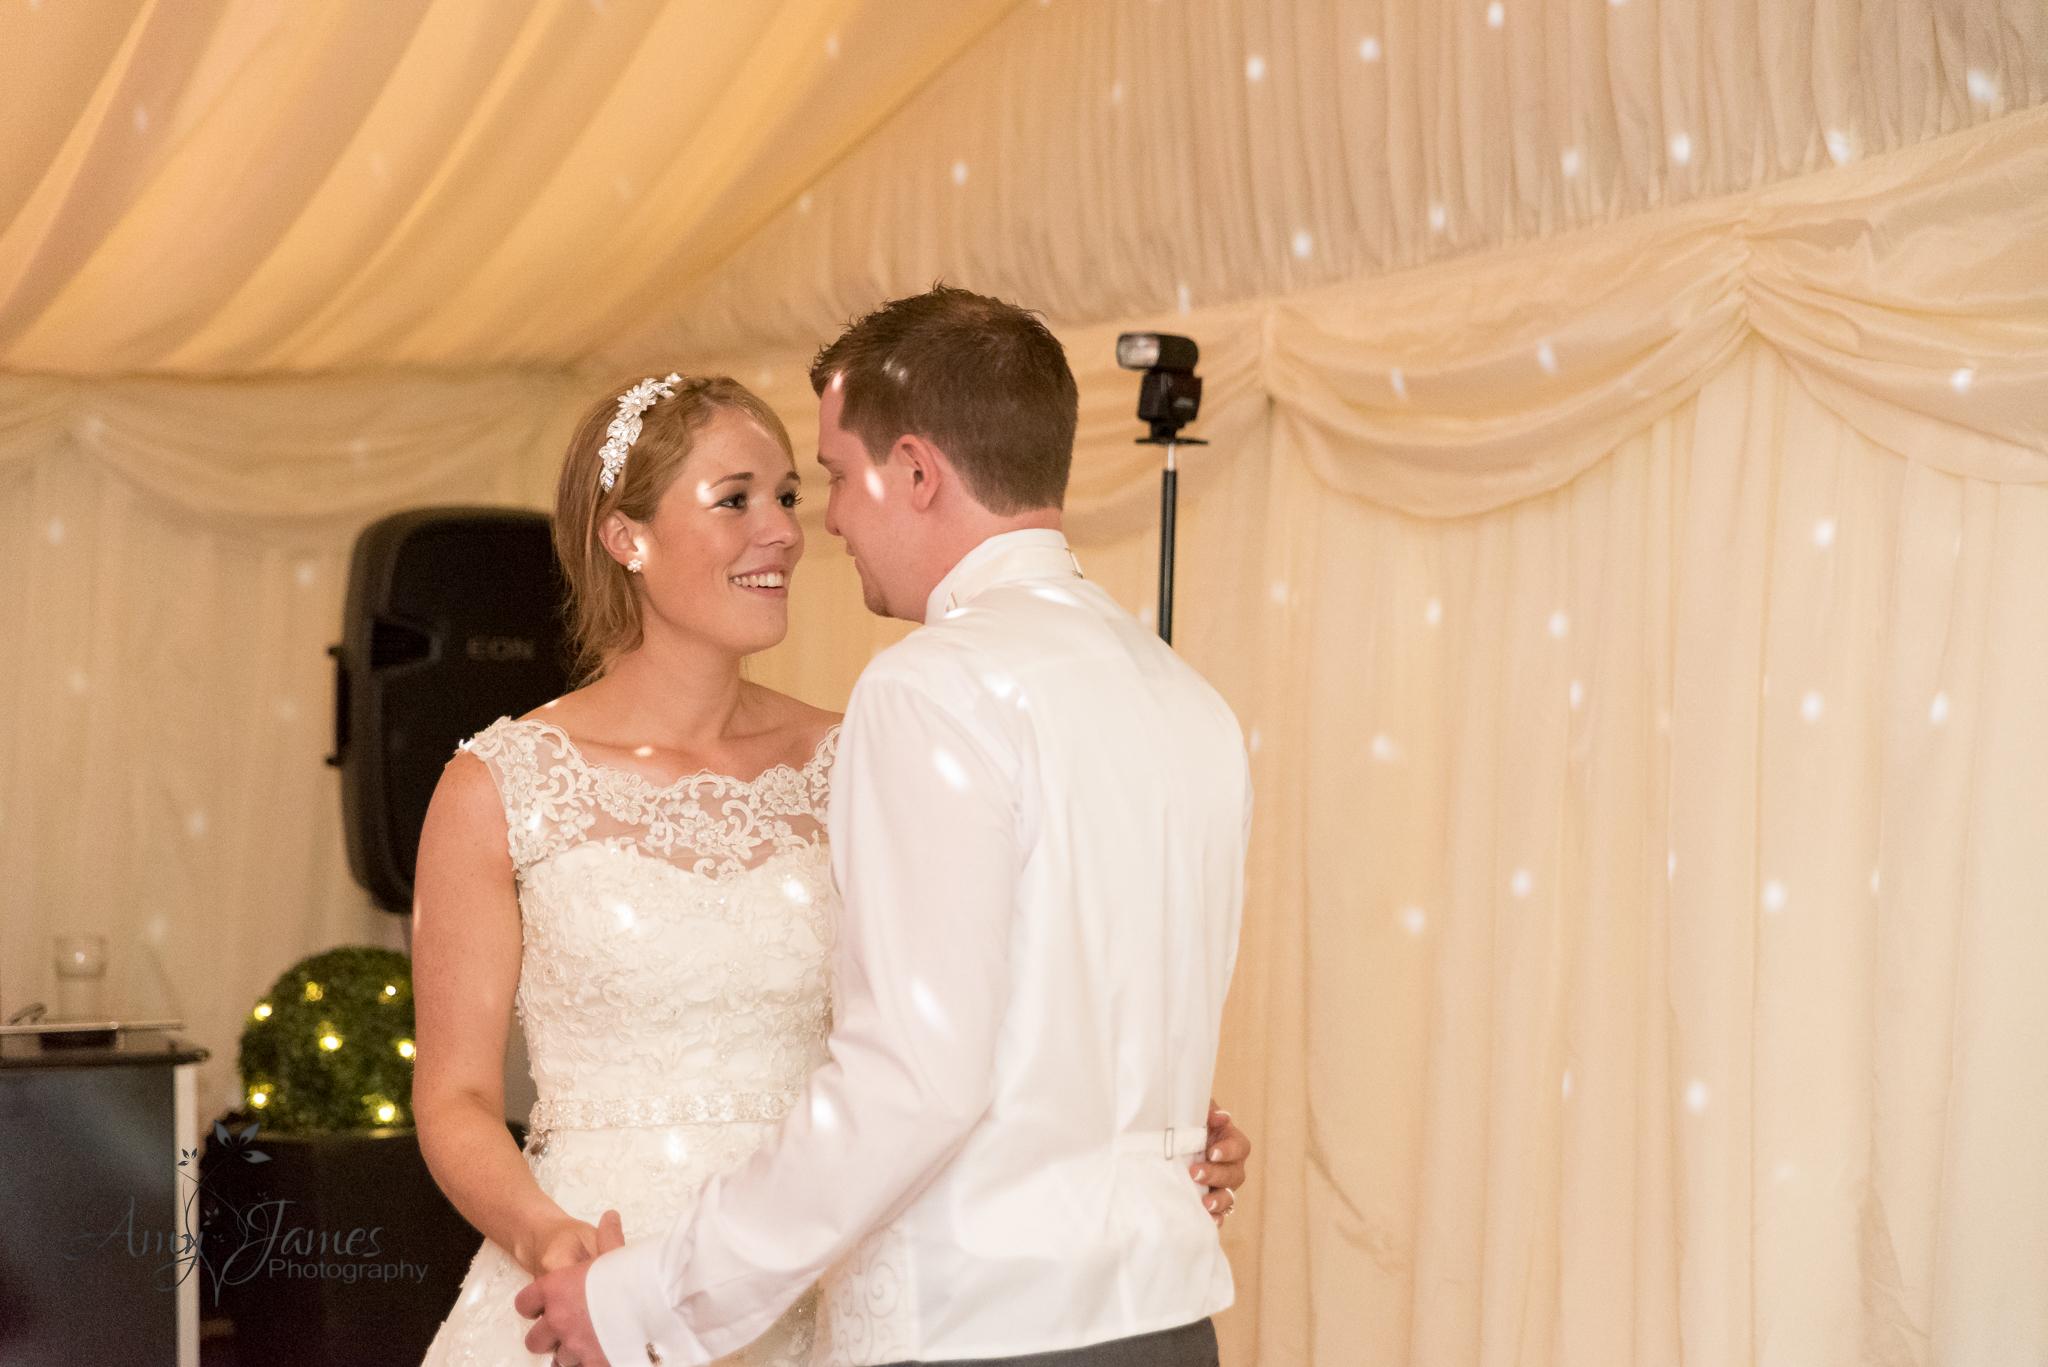 Hamphire wedding photographer